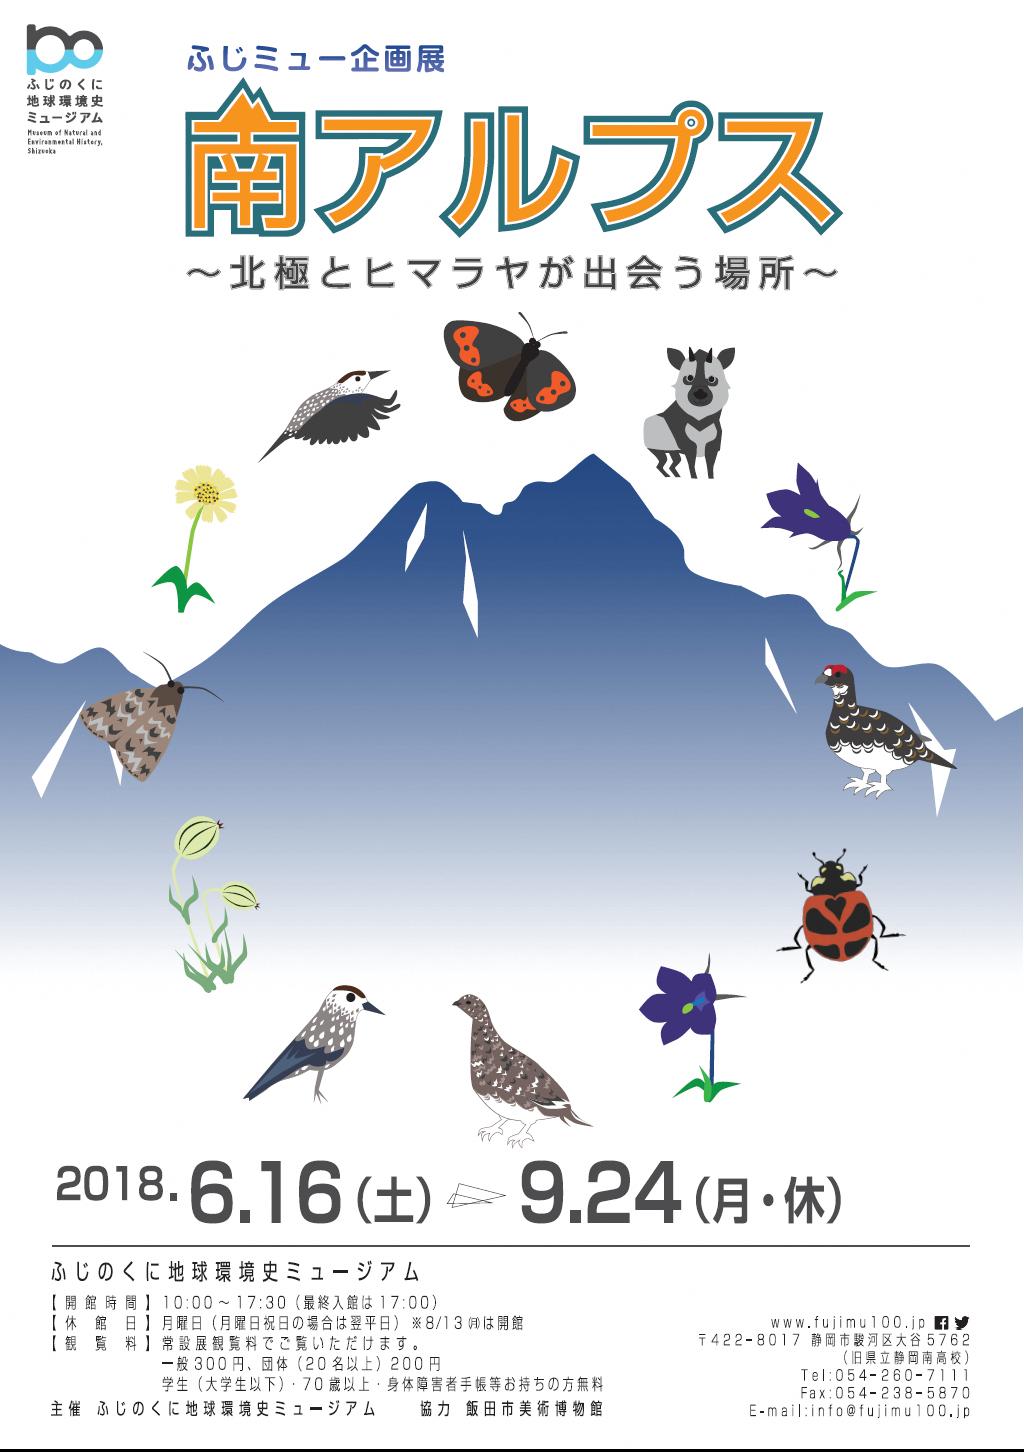 http://www.shizutan.jp/learning/images/%E5%8D%97%E3%82%A2%E5%B1%95.png